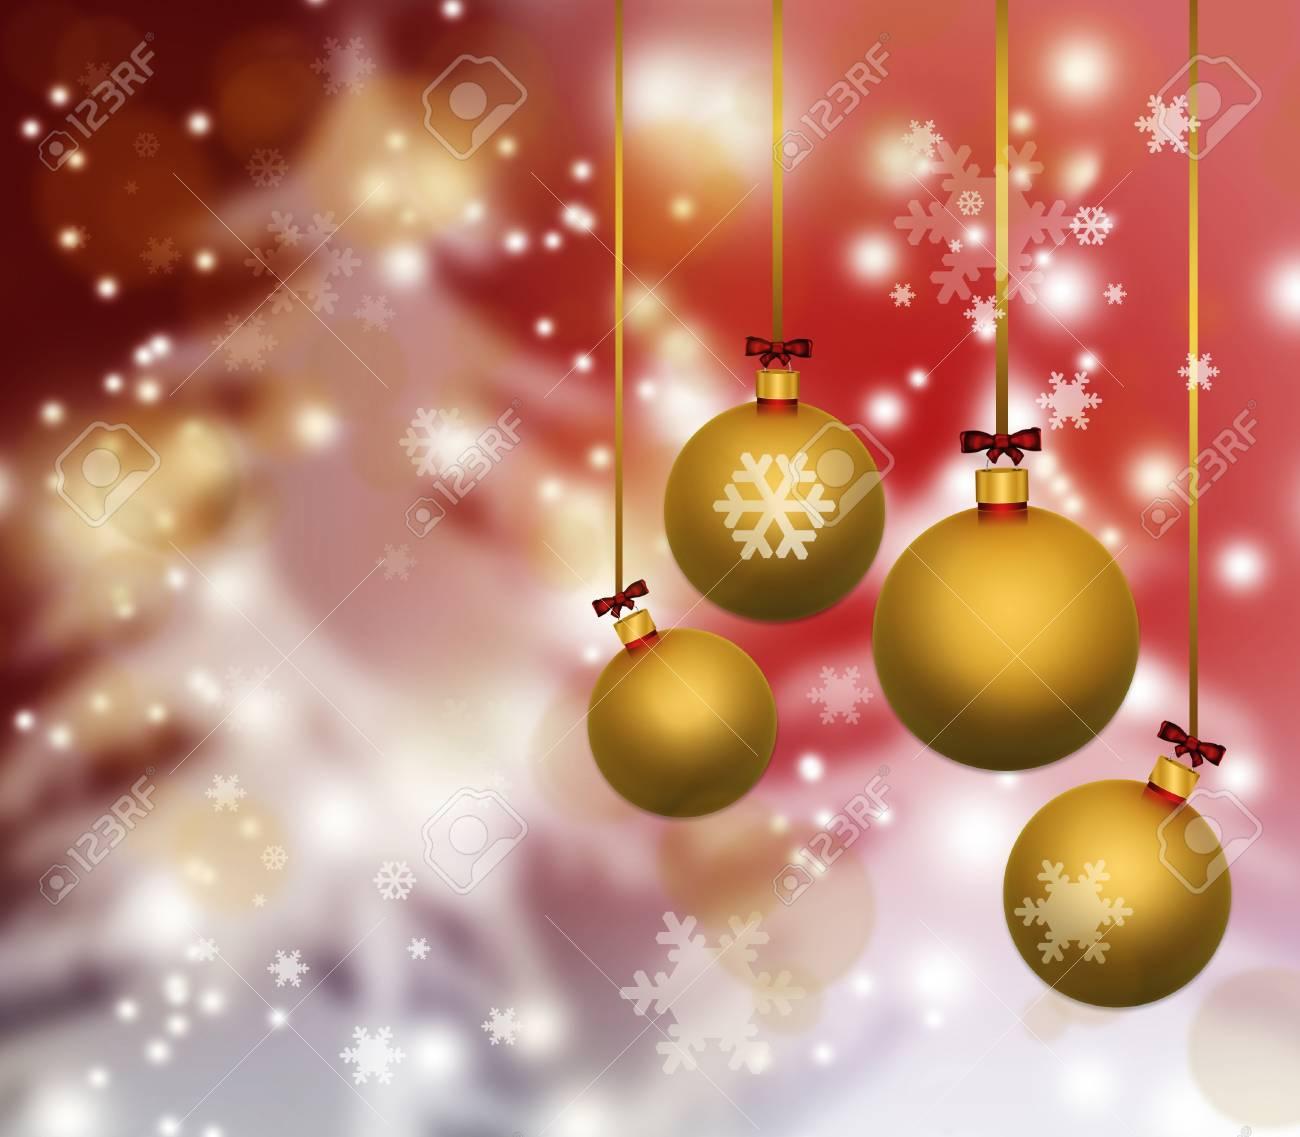 Christmas Background Stock Photo - 16499376